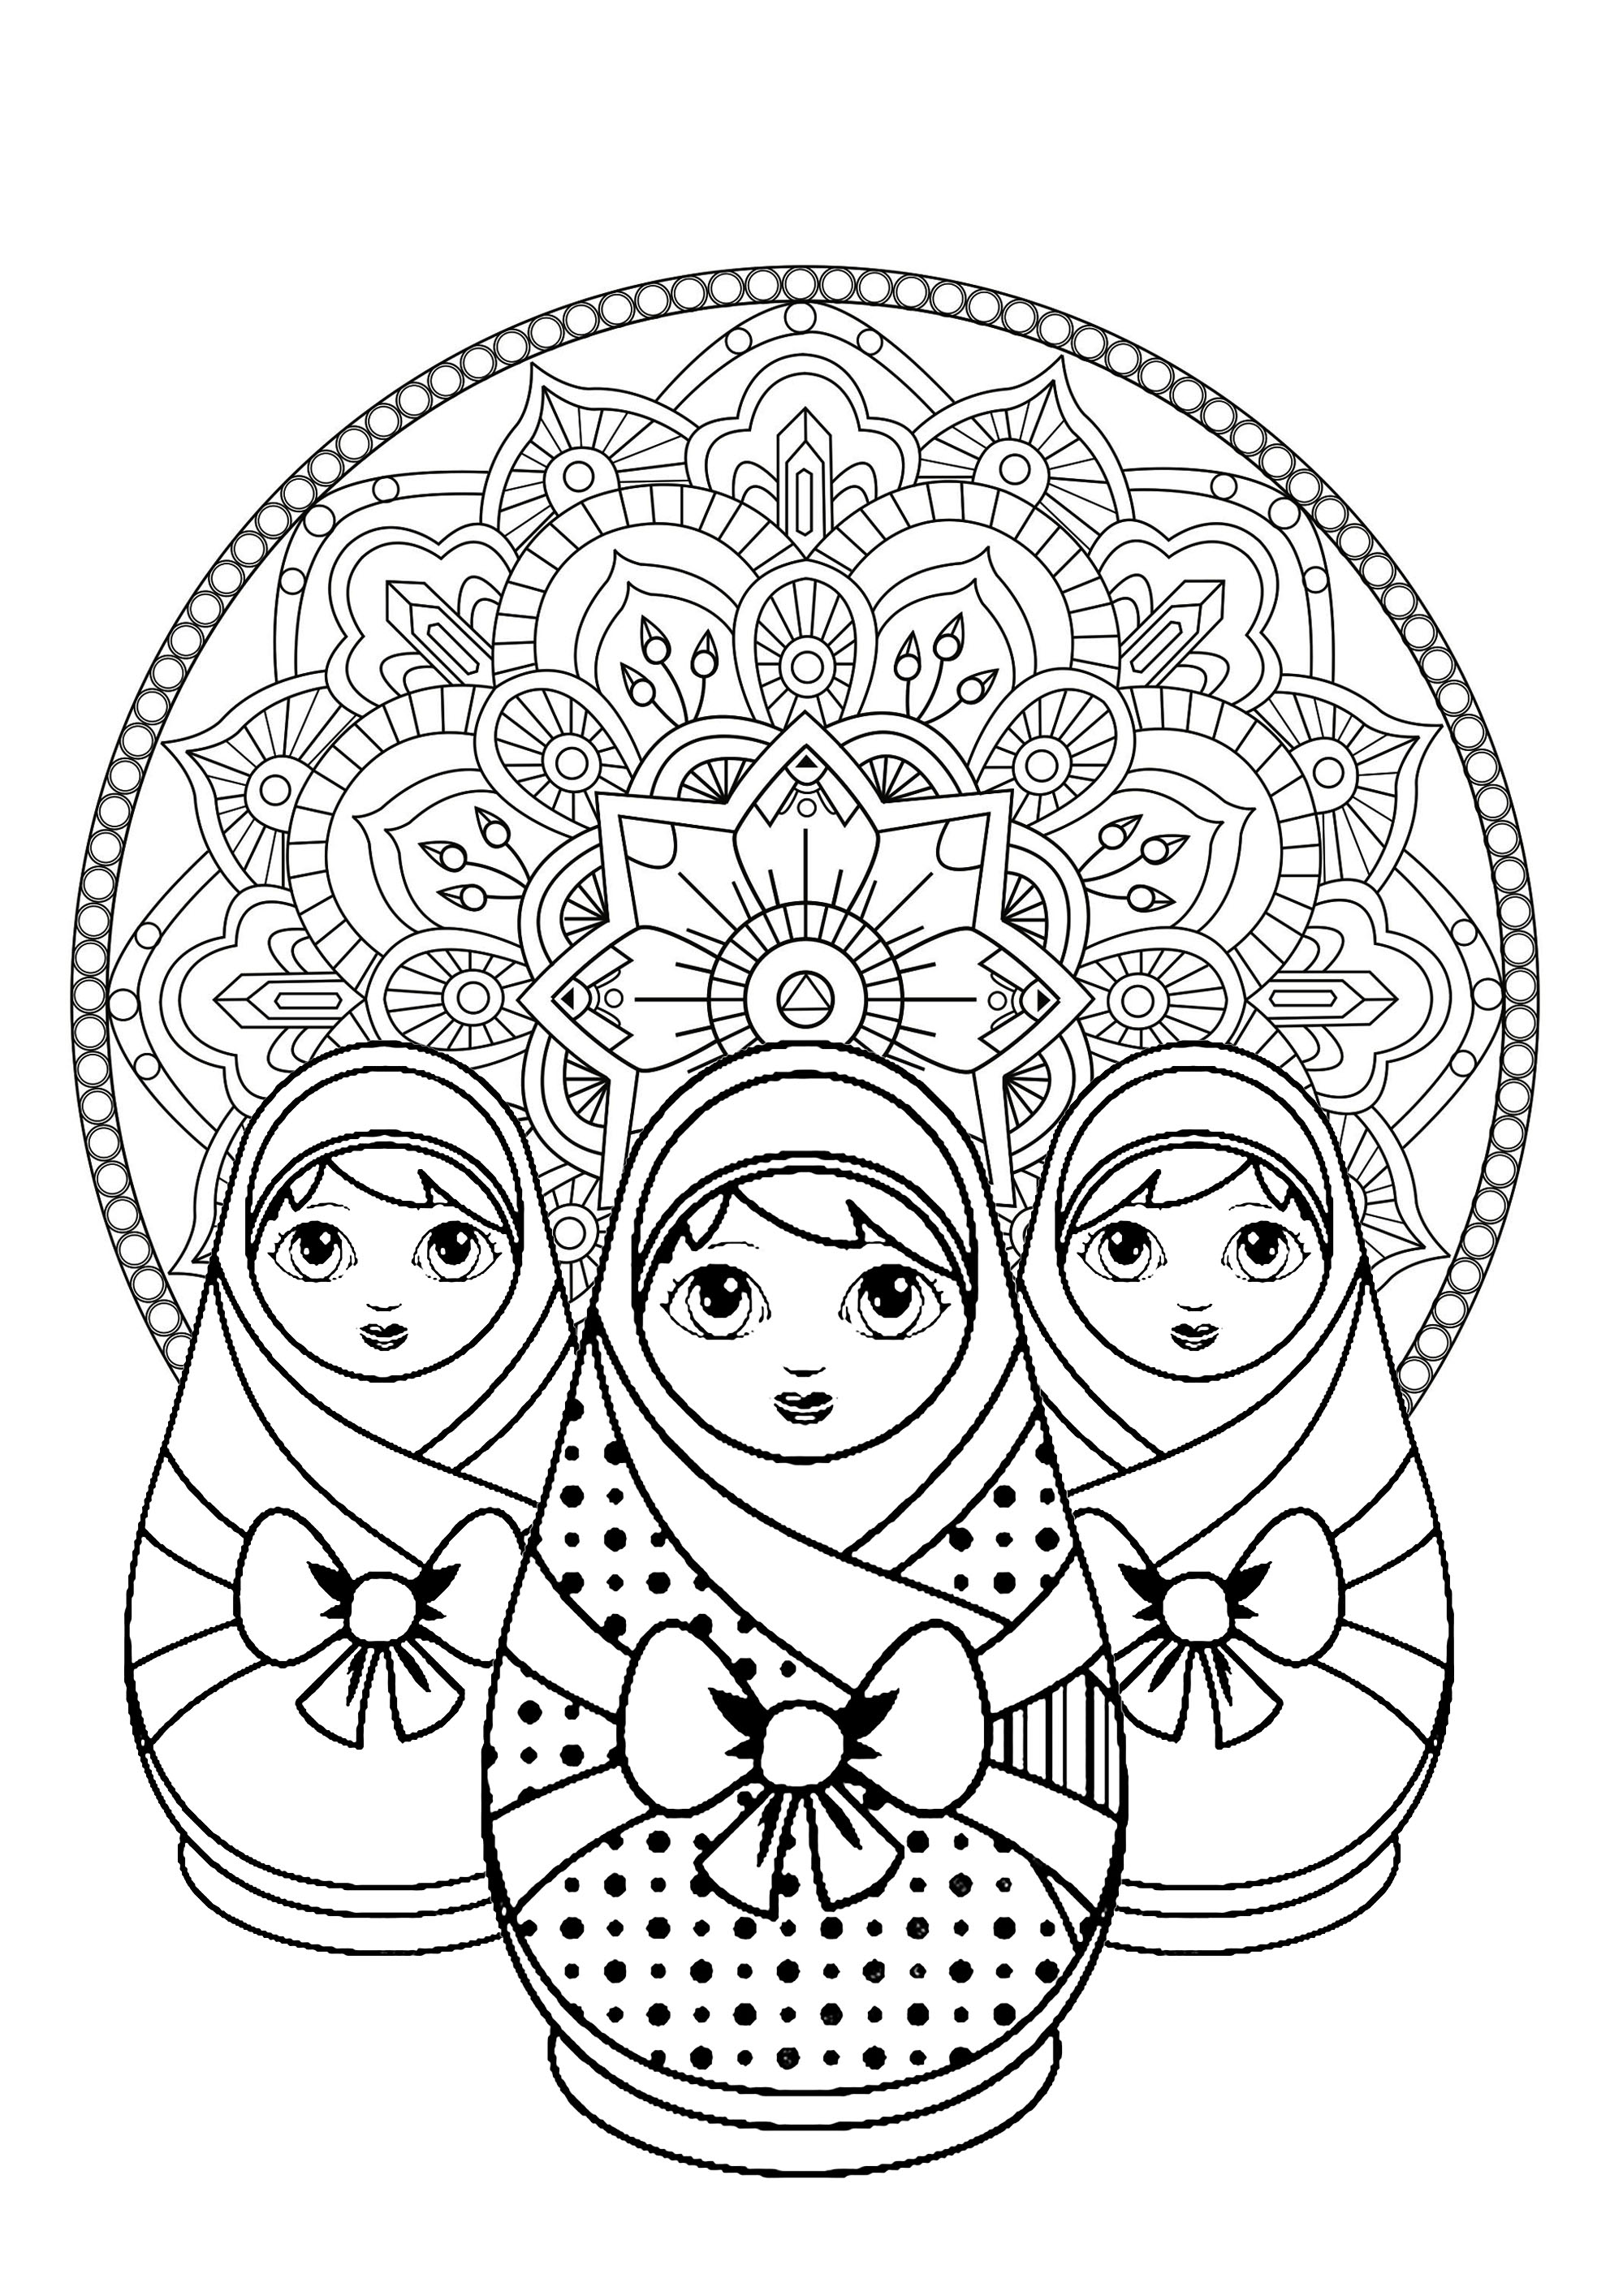 Colorear para Adultos : Muñecas Rusas - 4